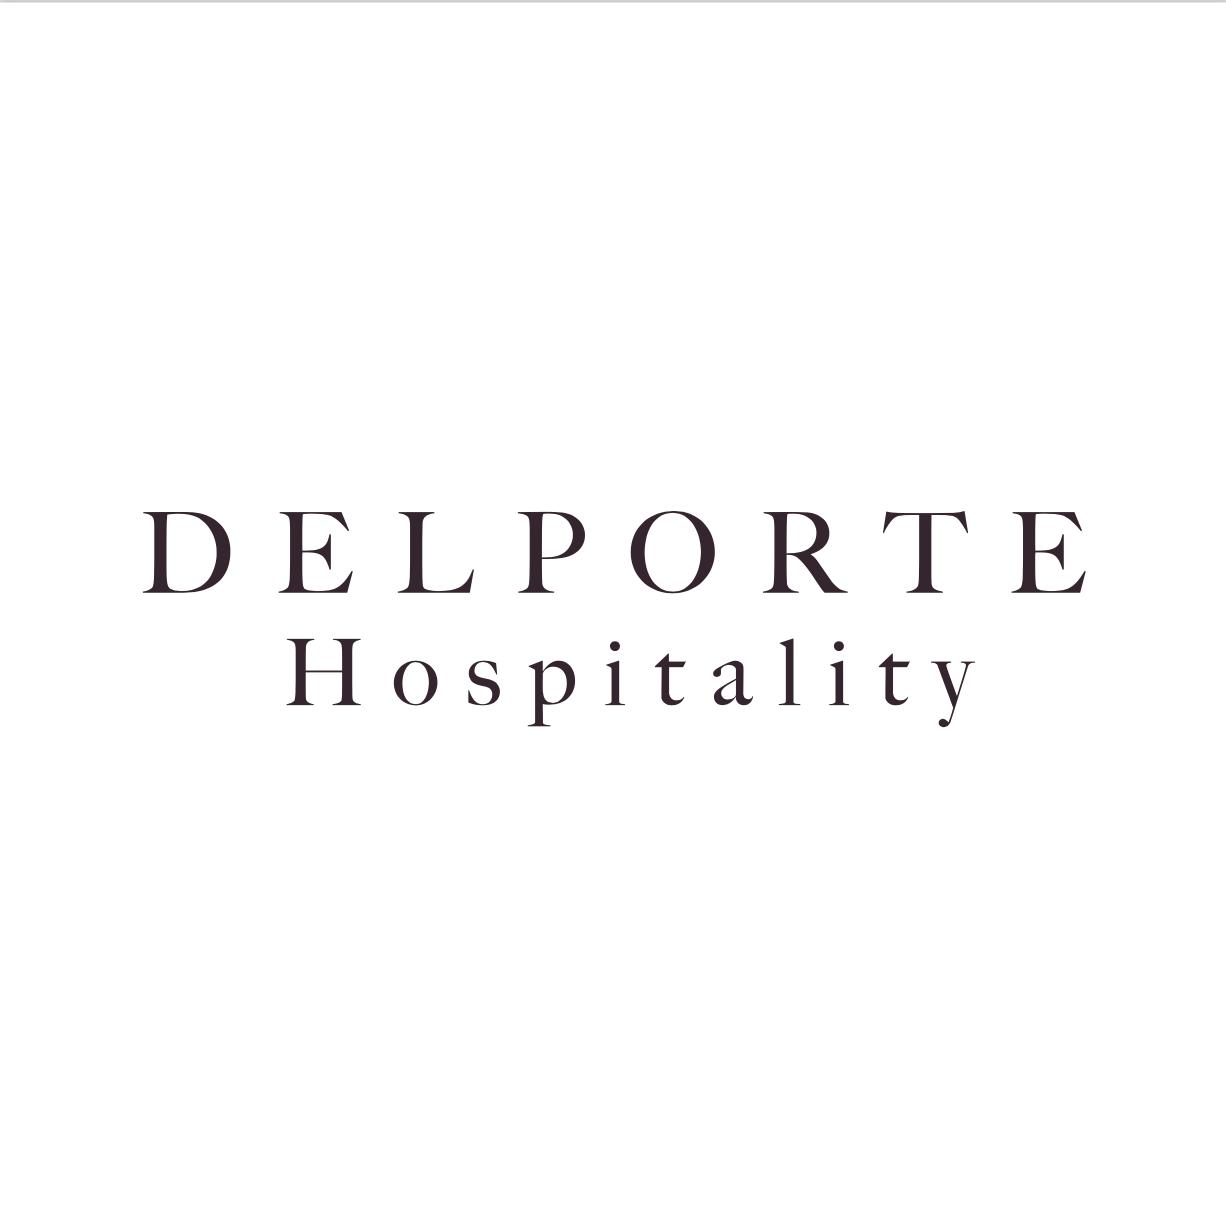 delporte hospitality